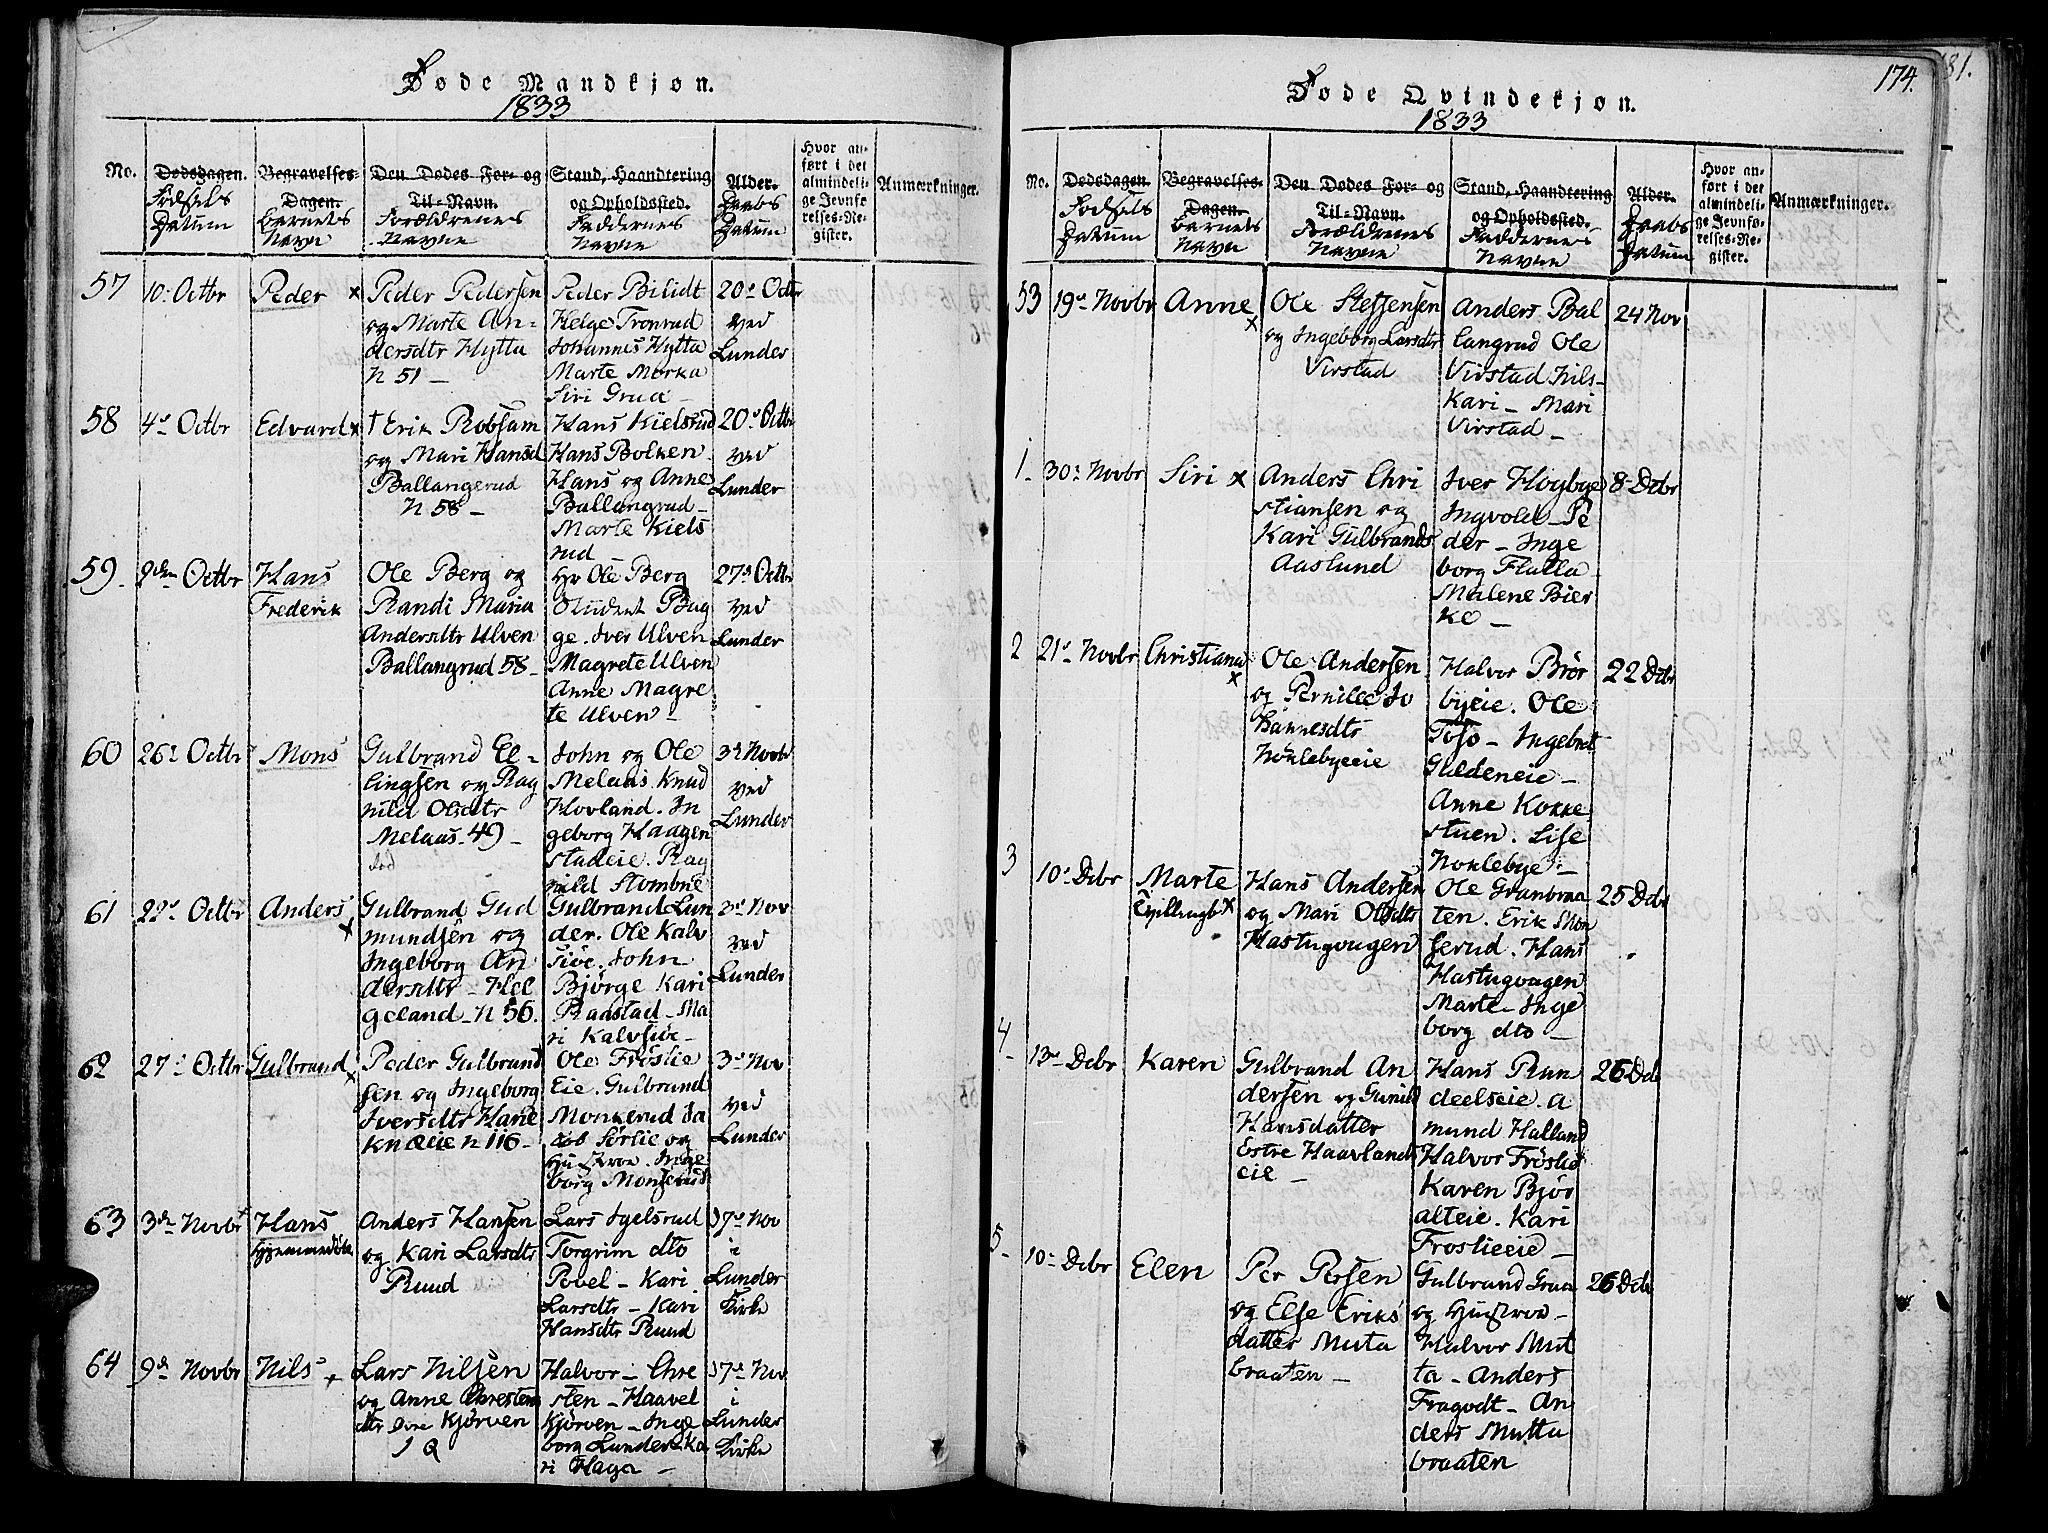 SAH, Jevnaker prestekontor, Ministerialbok nr. 5, 1815-1837, s. 174